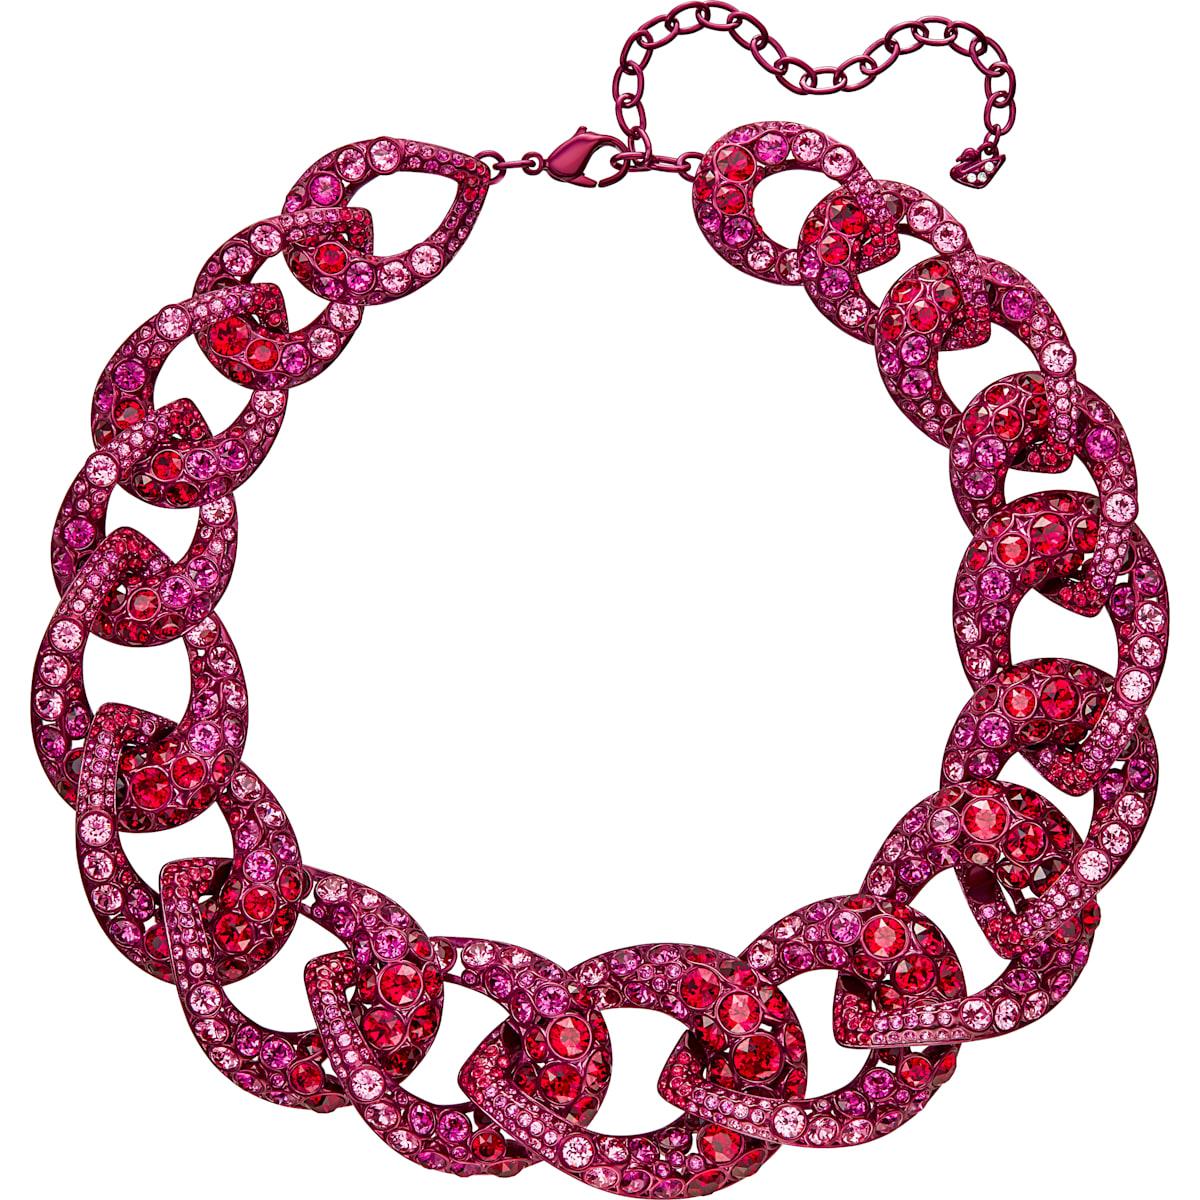 Tabloid Halskette, mehrfarbig